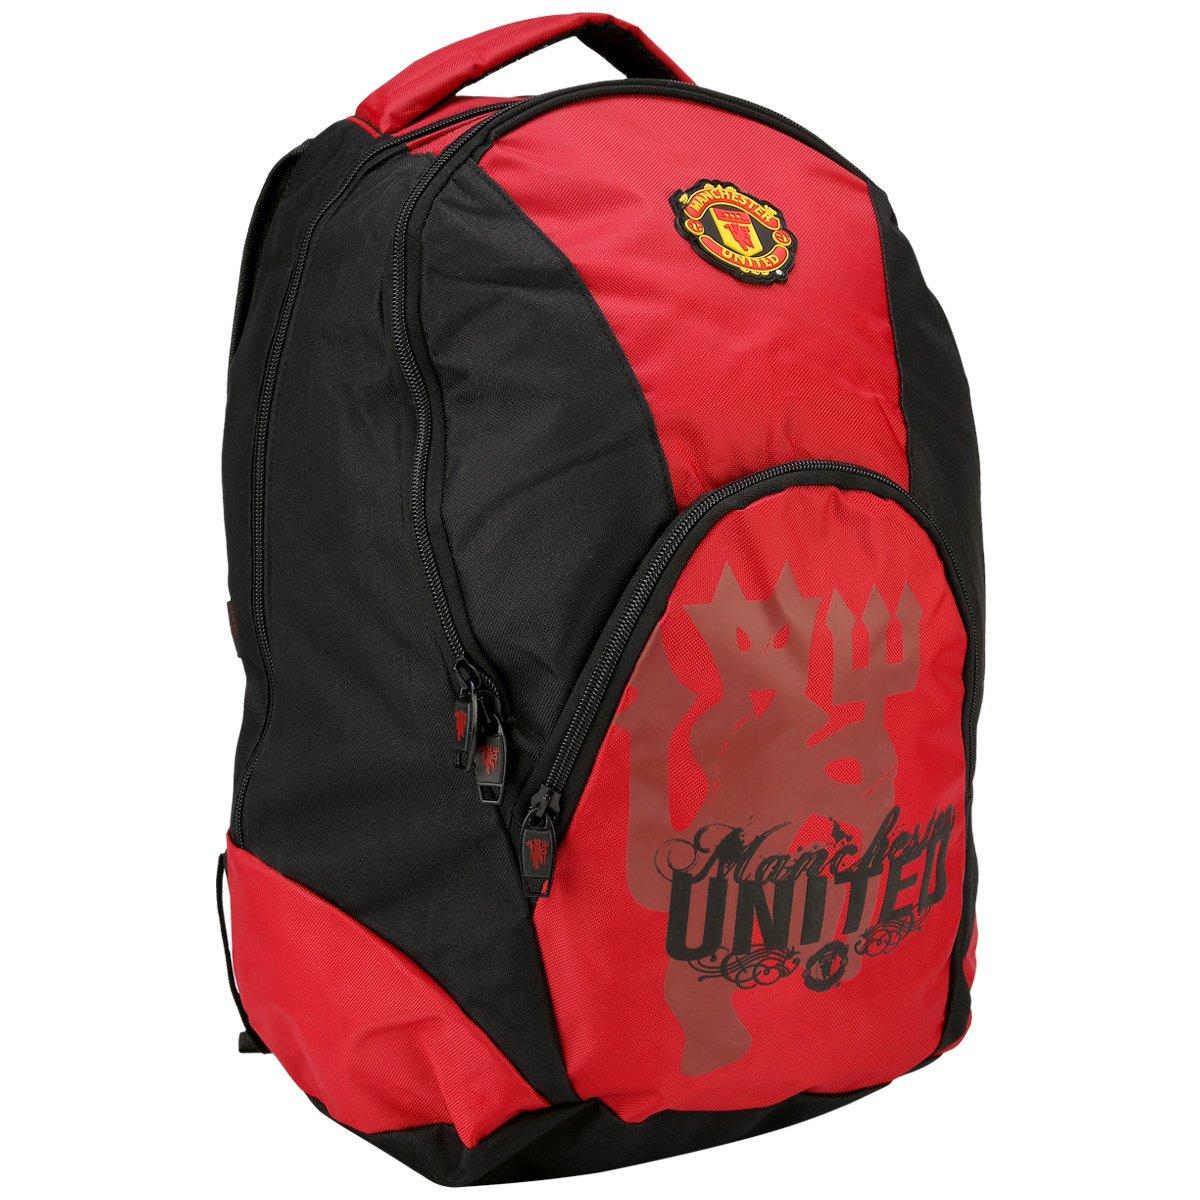 ad751a6af Mochila Manchester United - Compre Agora